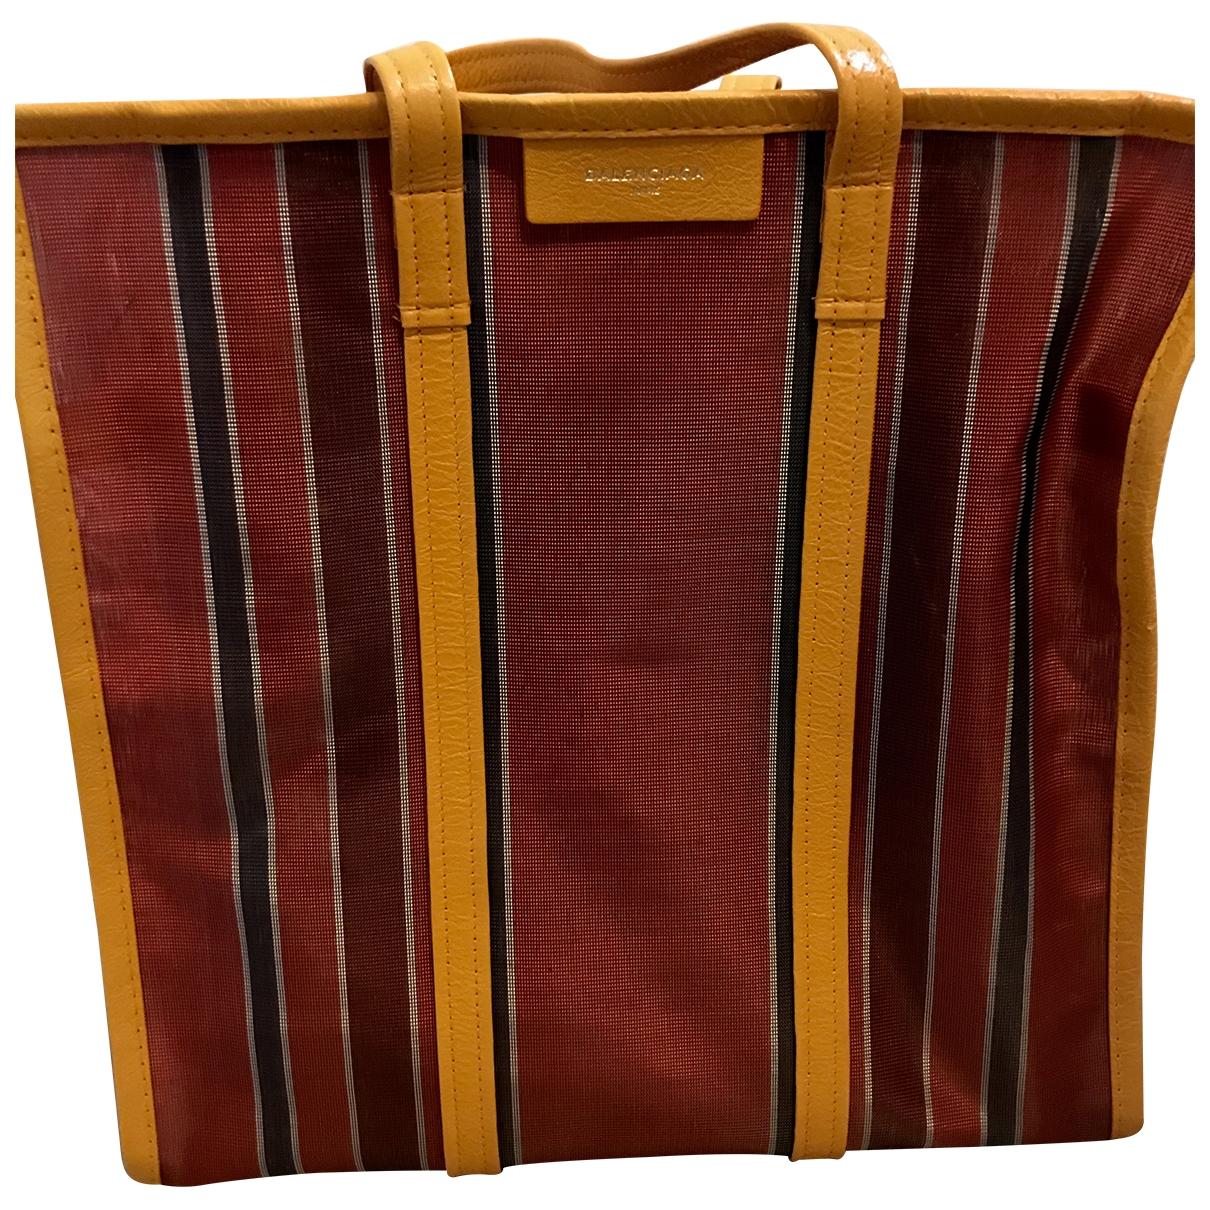 Balenciaga Bazar Bag Burgundy Cloth handbag for Women \N